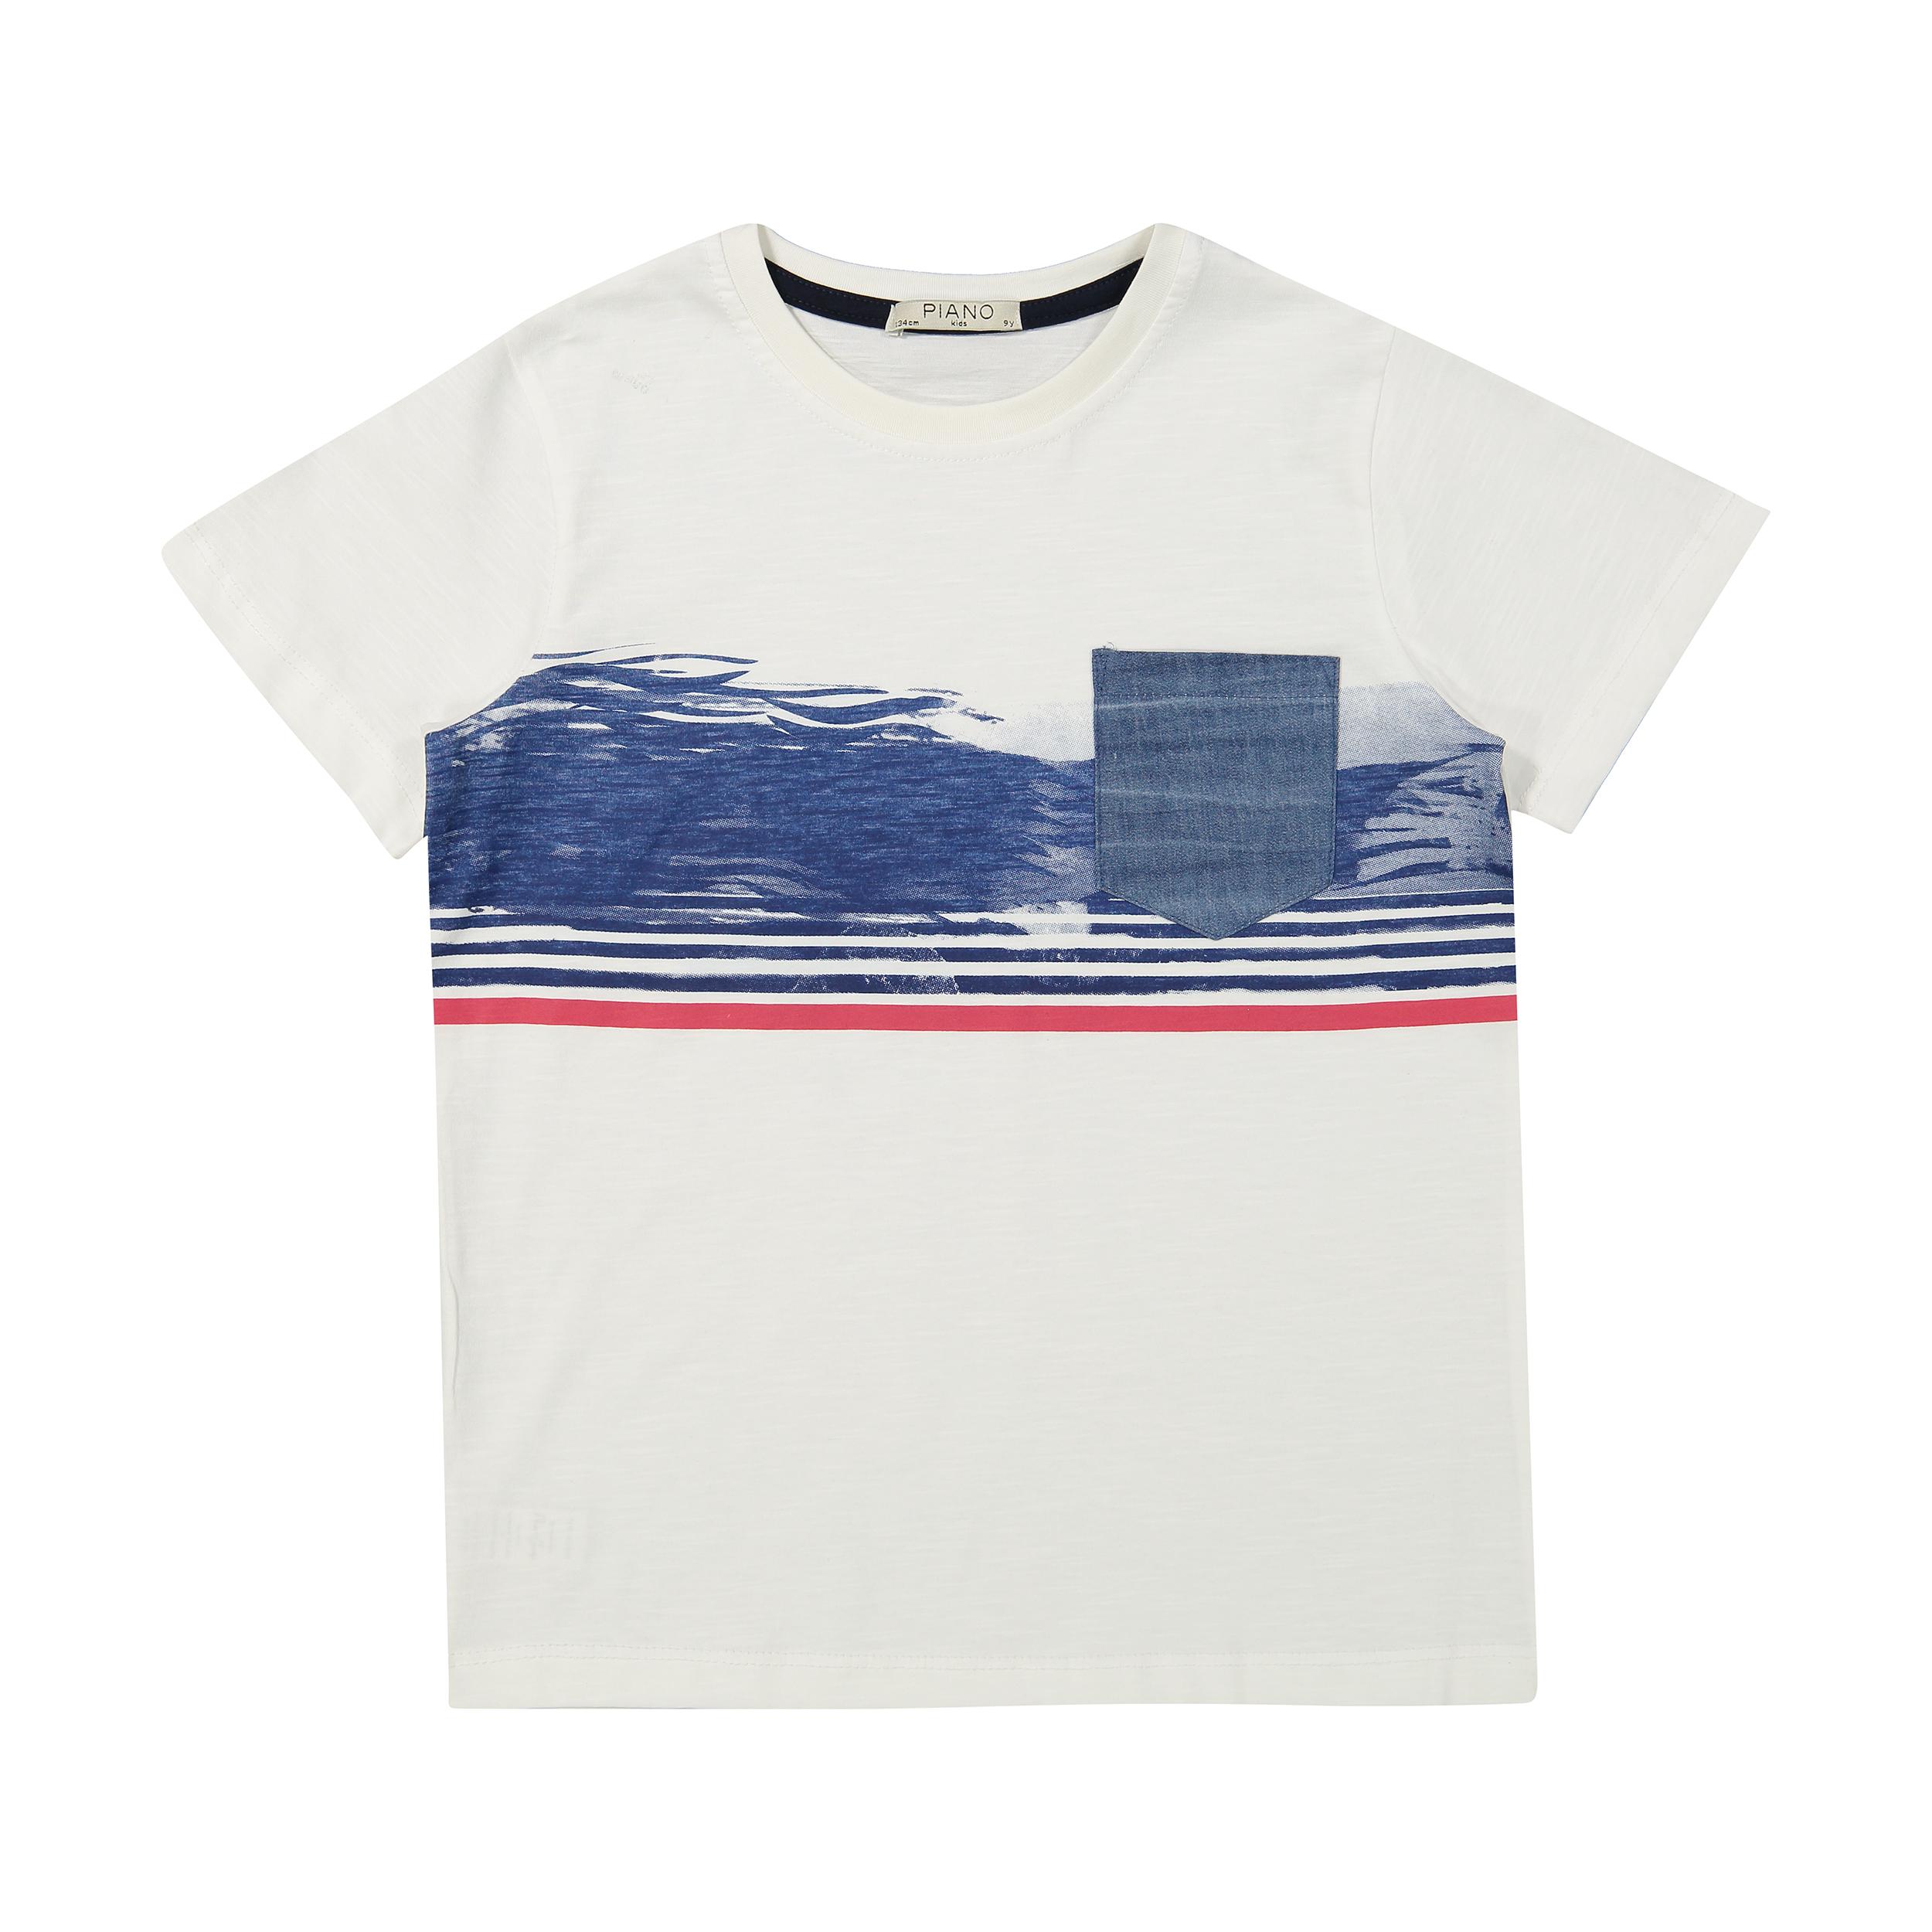 تی شرت پسرانه پیانو مدل 01530-1